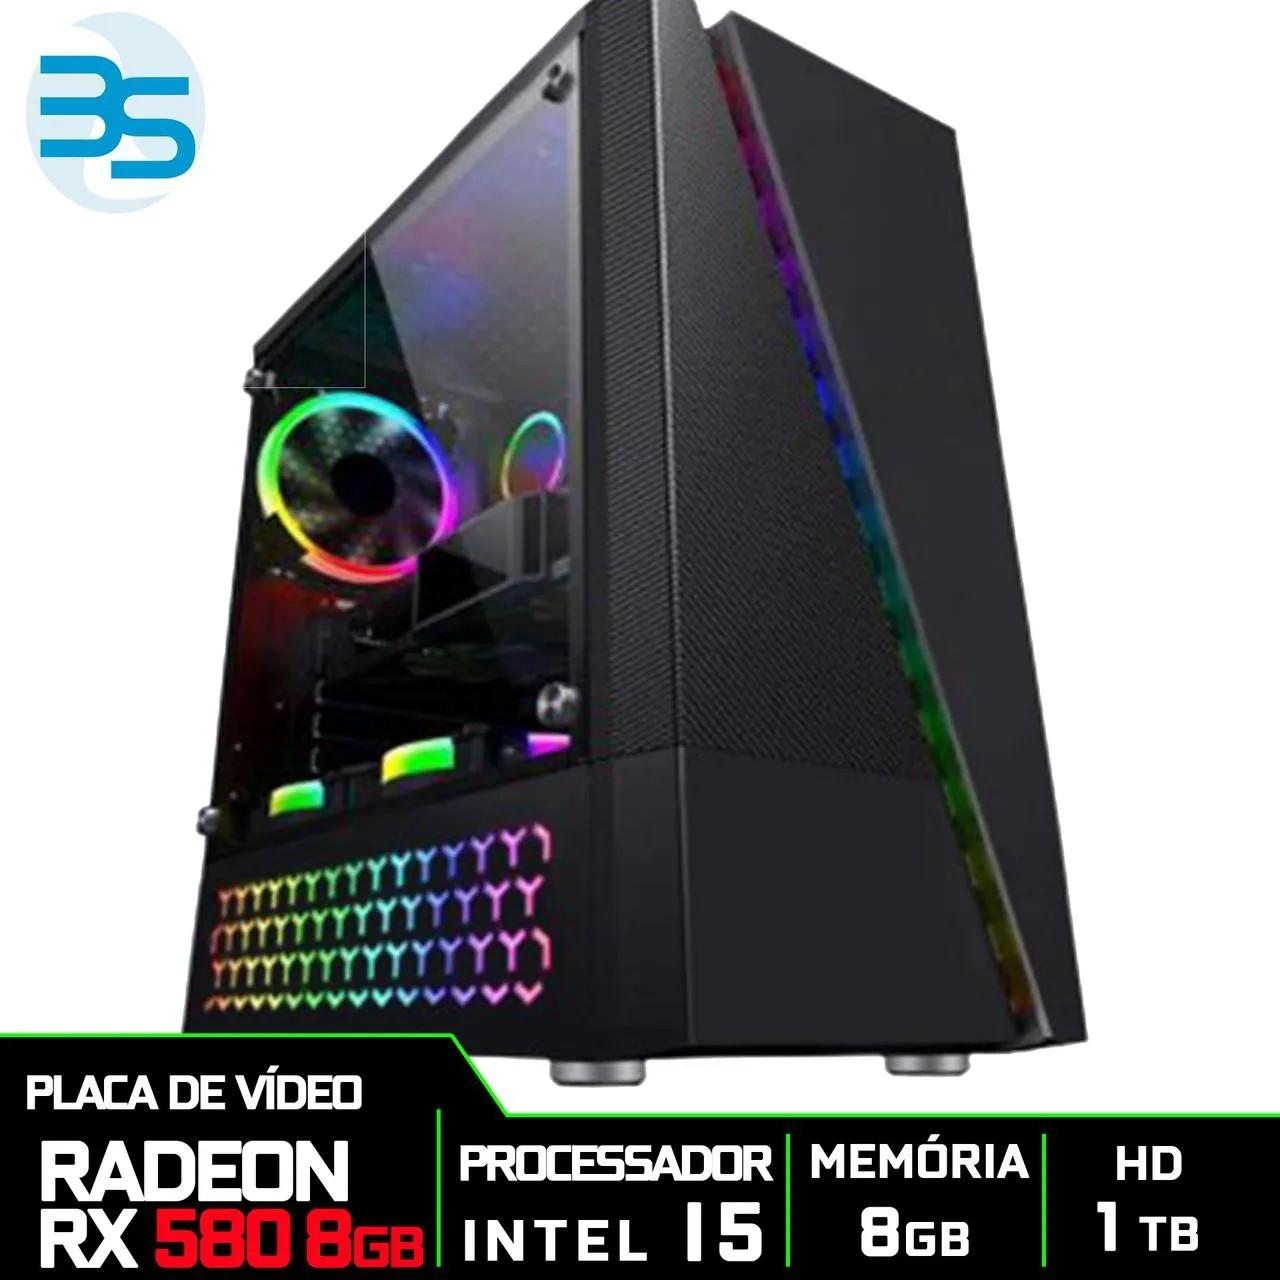 Bs Gamer Intel I5 9400F 2.9GHZ 9MB, 8GB DDR4, HD 1TB, 500W, RX 580 8GB